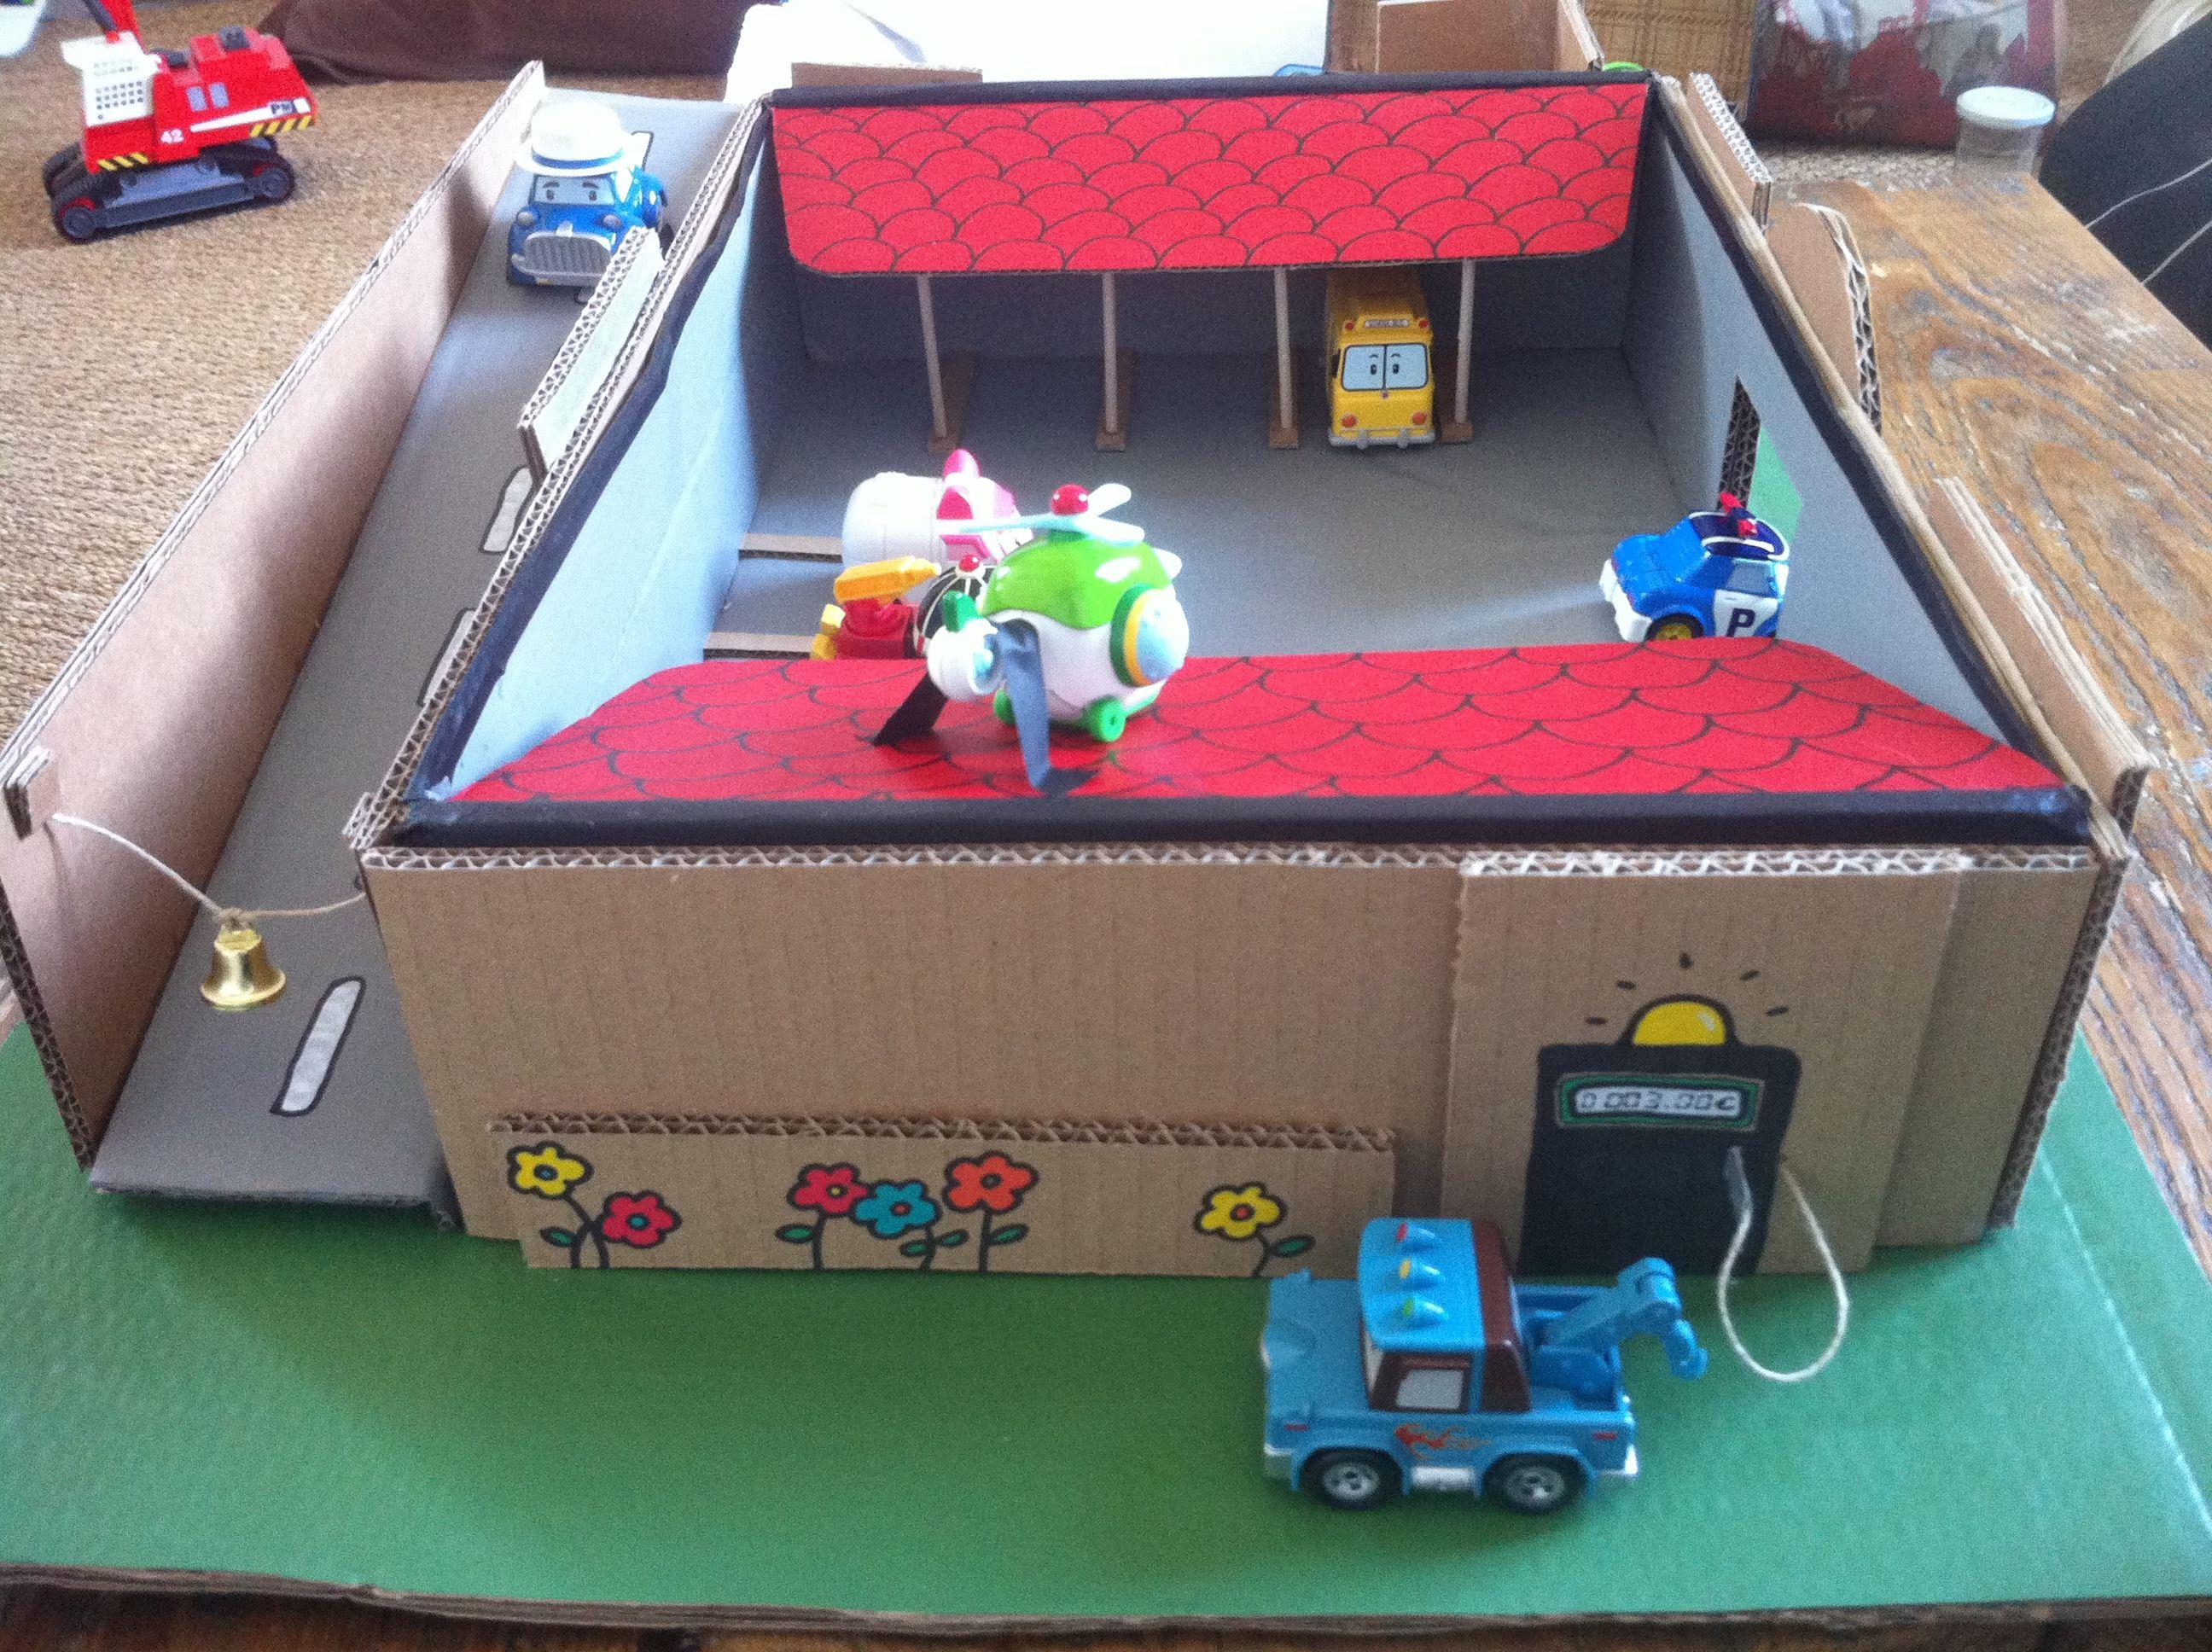 garage en carton robot car poli coin essence giochi gugu garage toys e diy. Black Bedroom Furniture Sets. Home Design Ideas